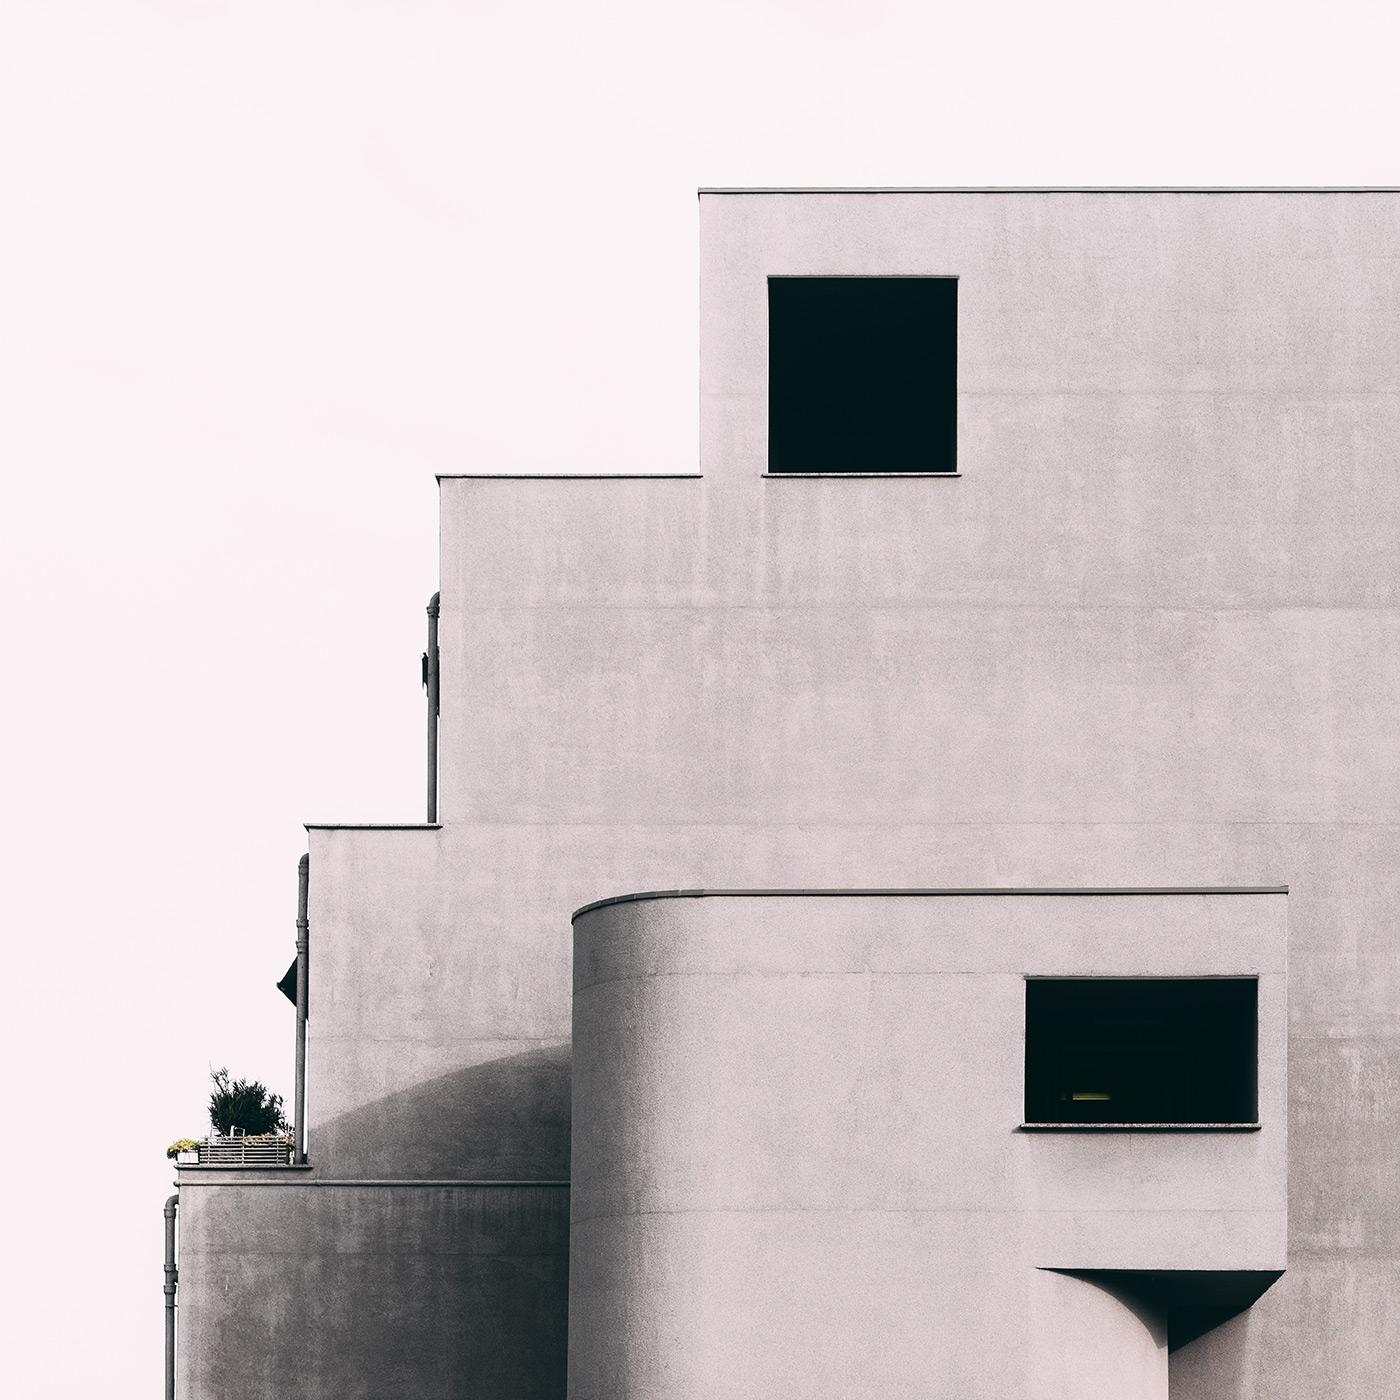 Gallaratese Quarter<br /> Location: Milan, Italy<br />Architects: Aldo Rossi and Carlo Aymonino